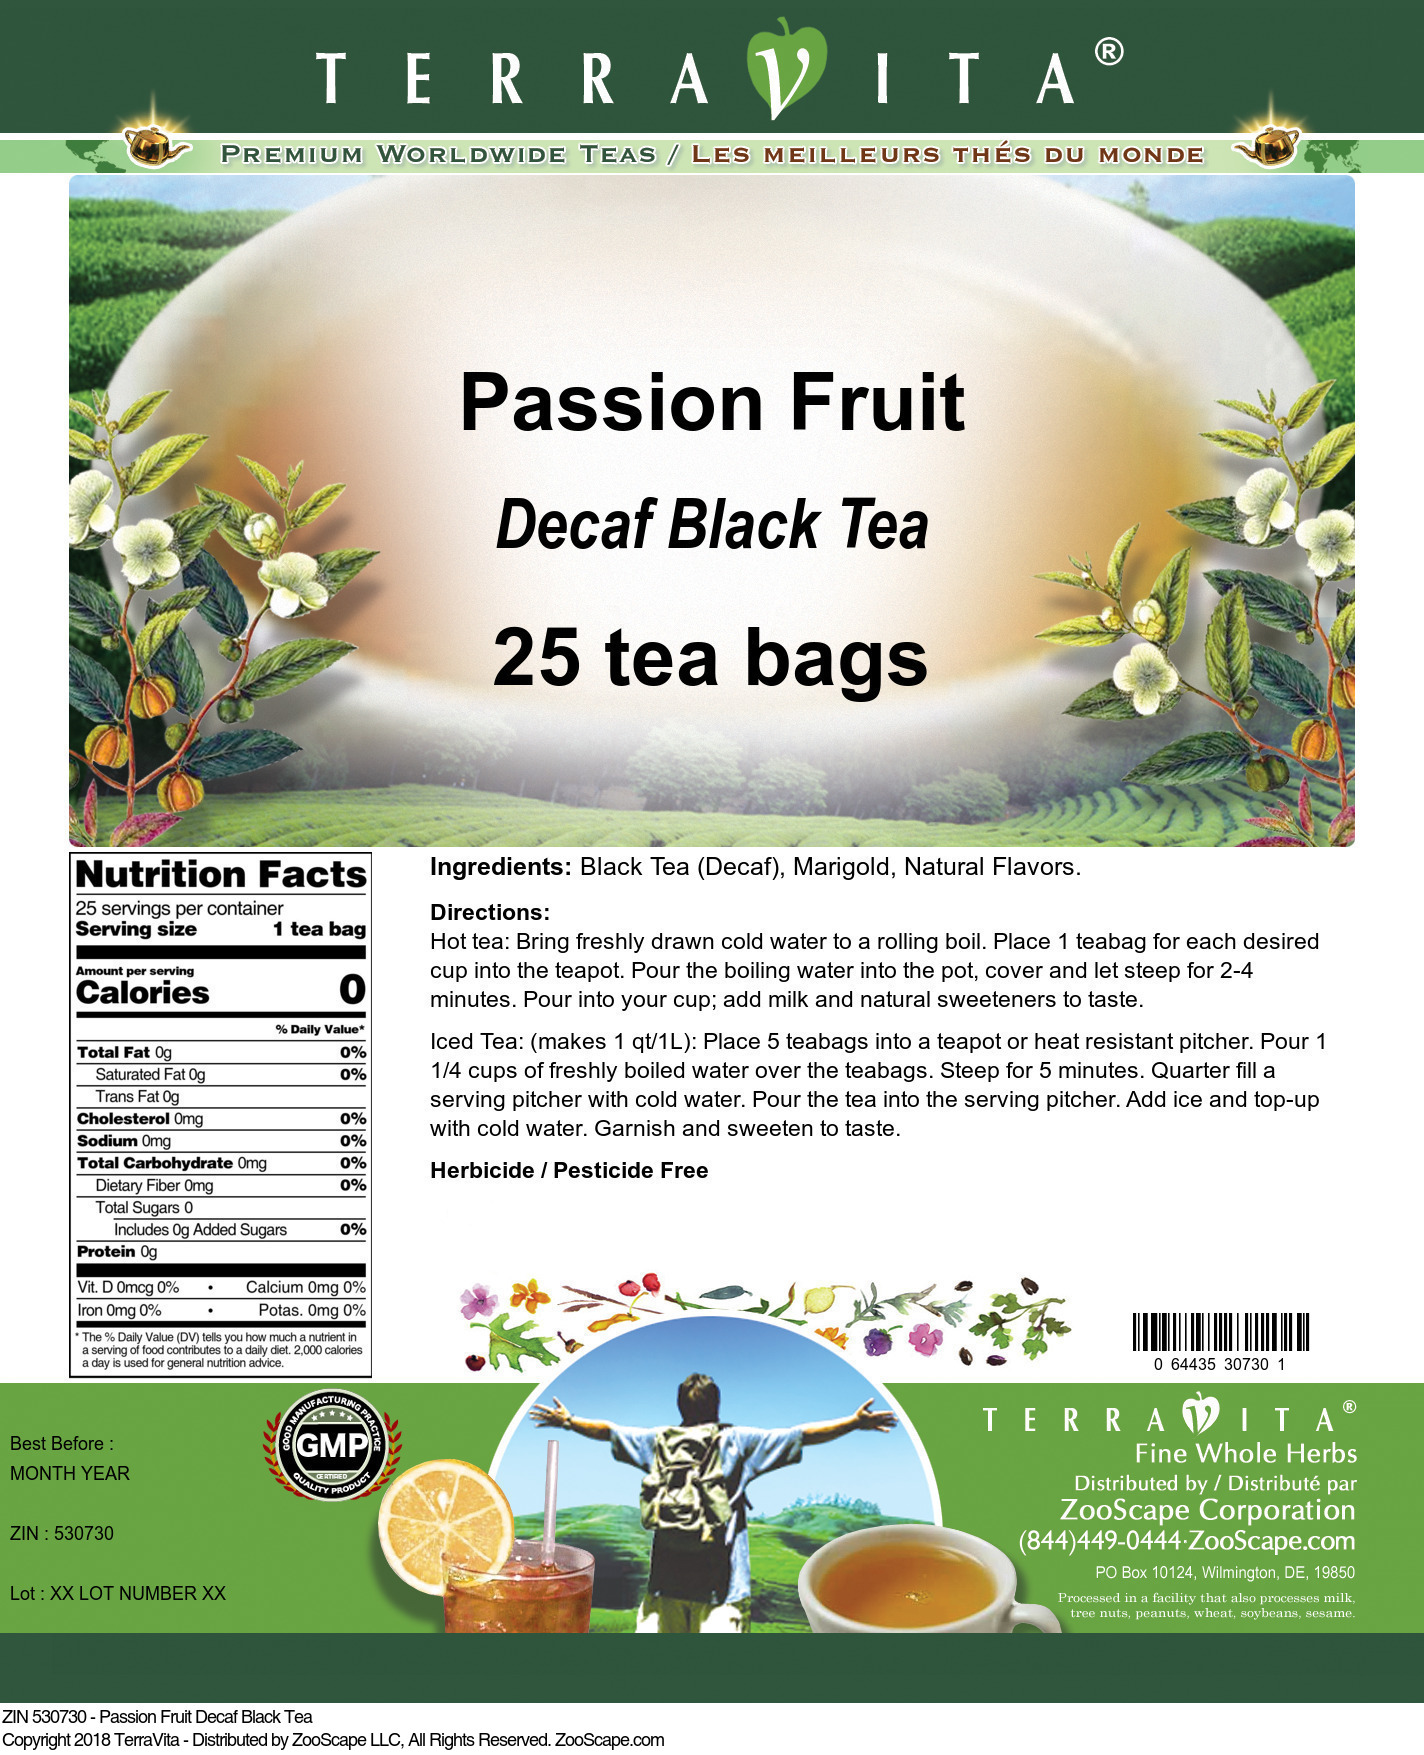 Passion Fruit Decaf Black Tea